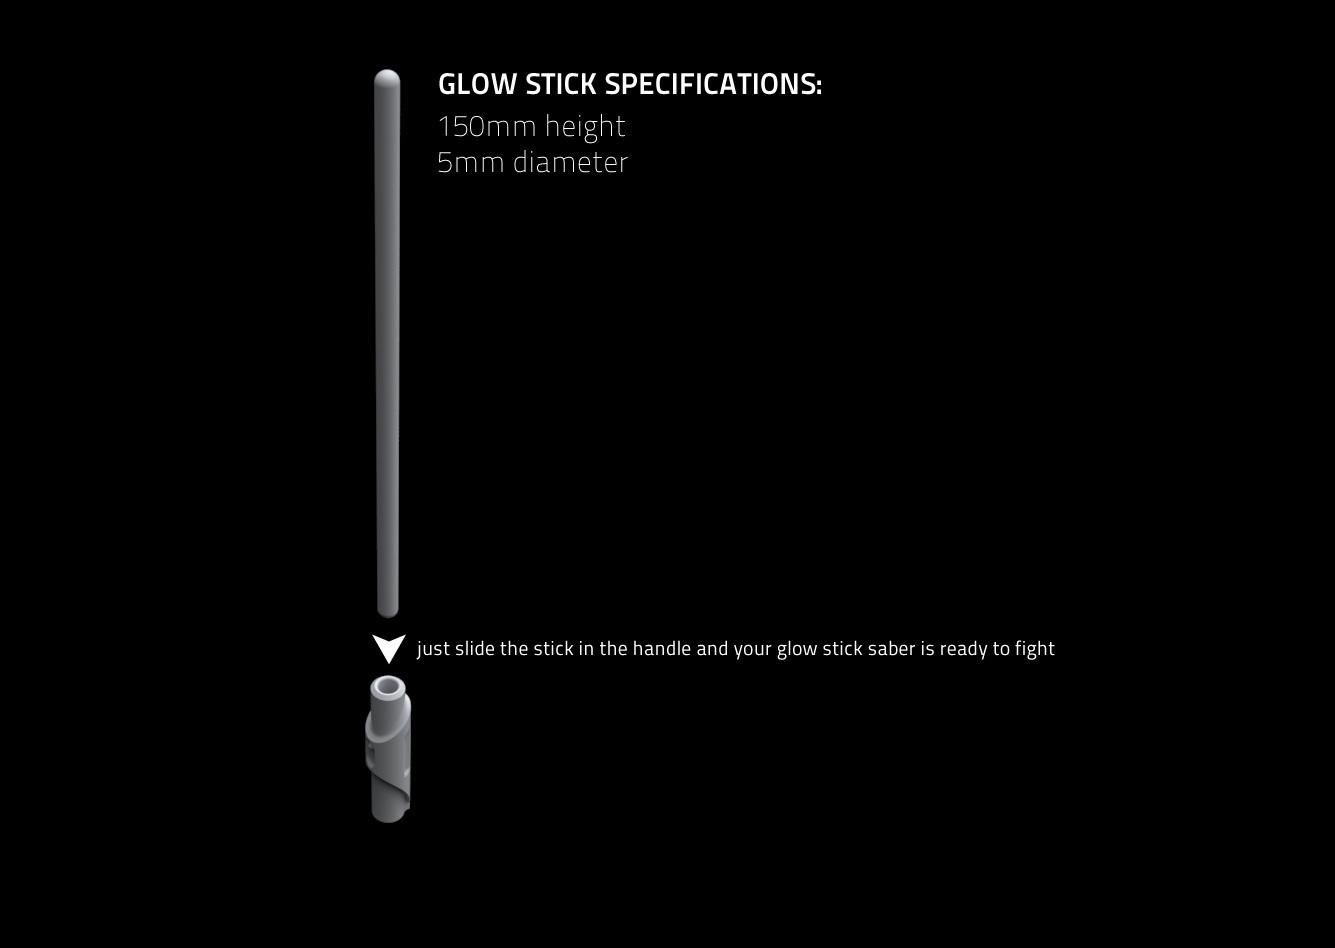 thingiverse_2.jpg Download free STL file Glow Stick Saber • 3D printer object, Shruikan-Arts